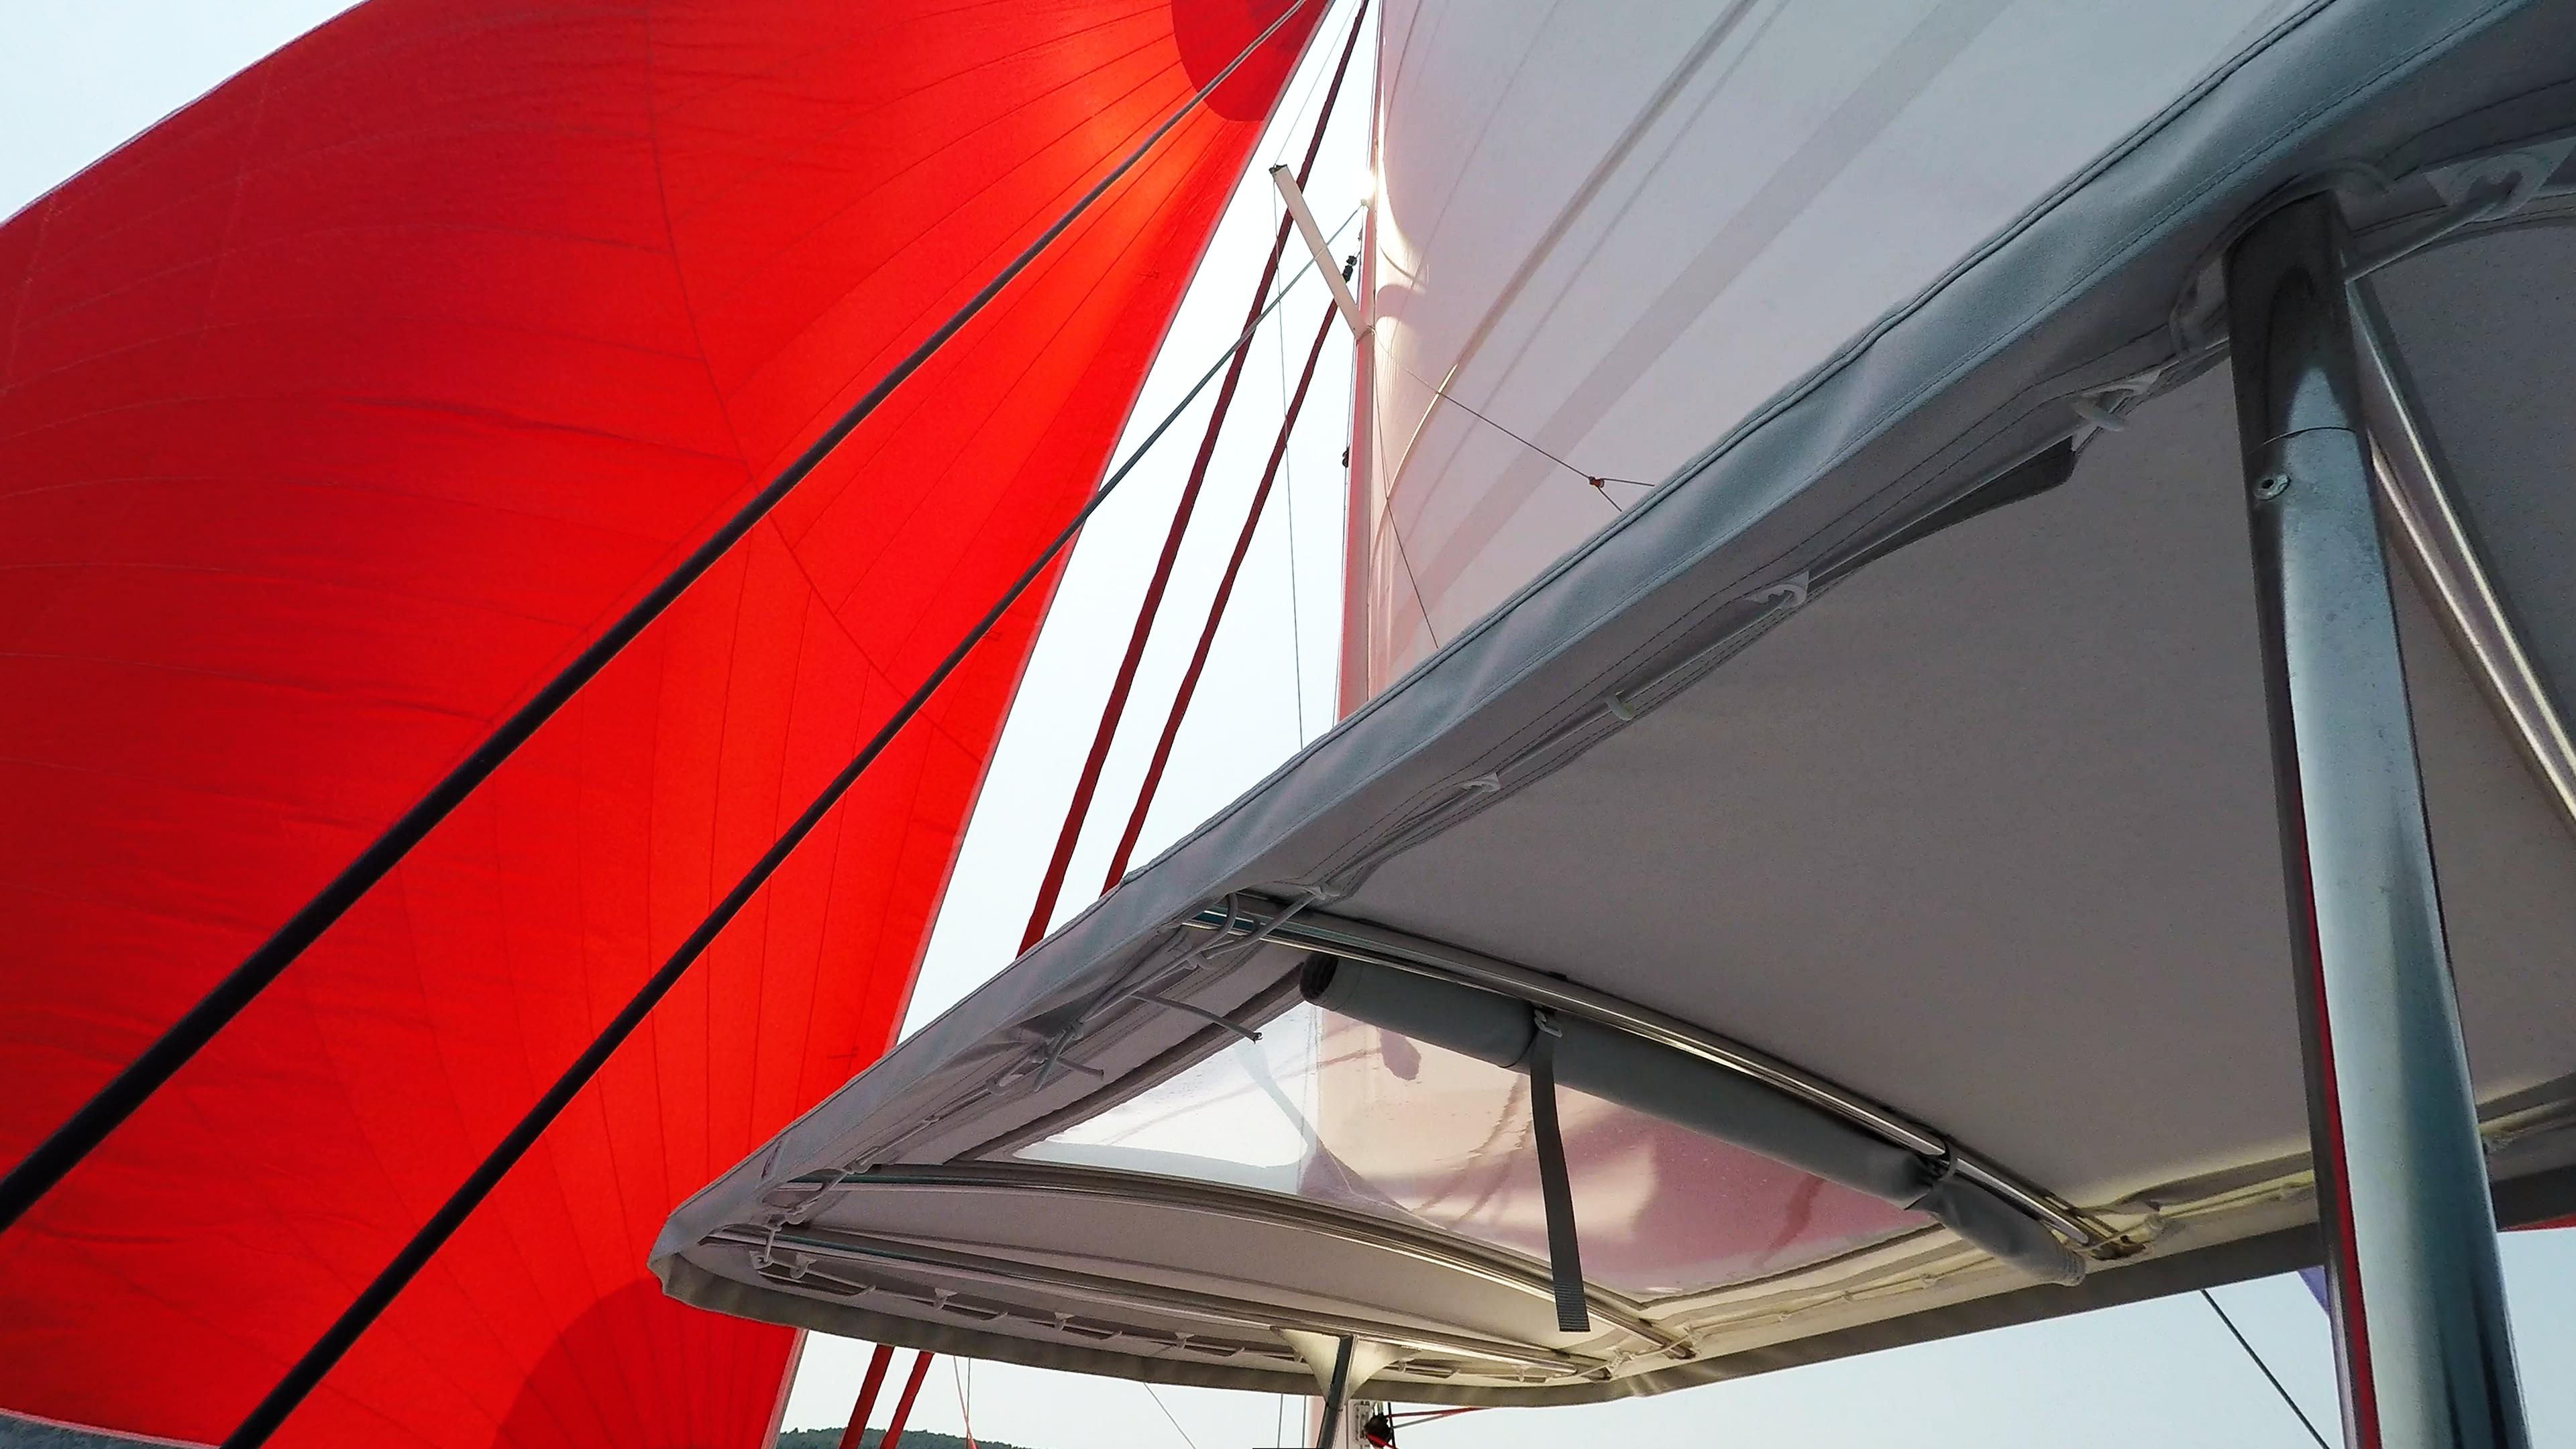 skipper cockpit cima sul trimarano barca a vela neel 45